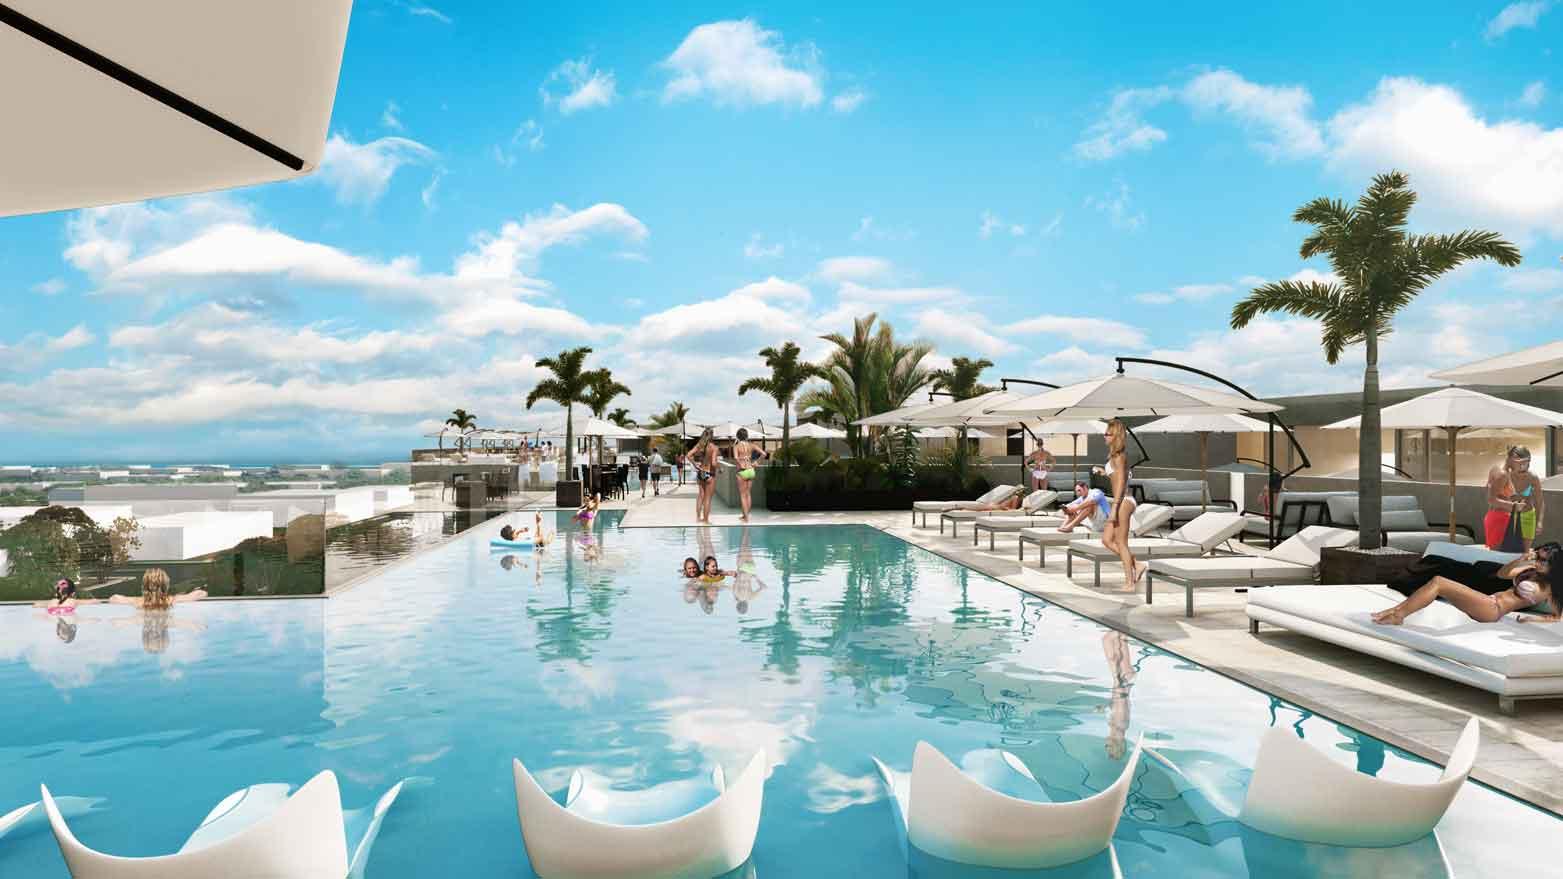 Siempre-playa---Playa-del-Carmen---Pelicano-Properties-2